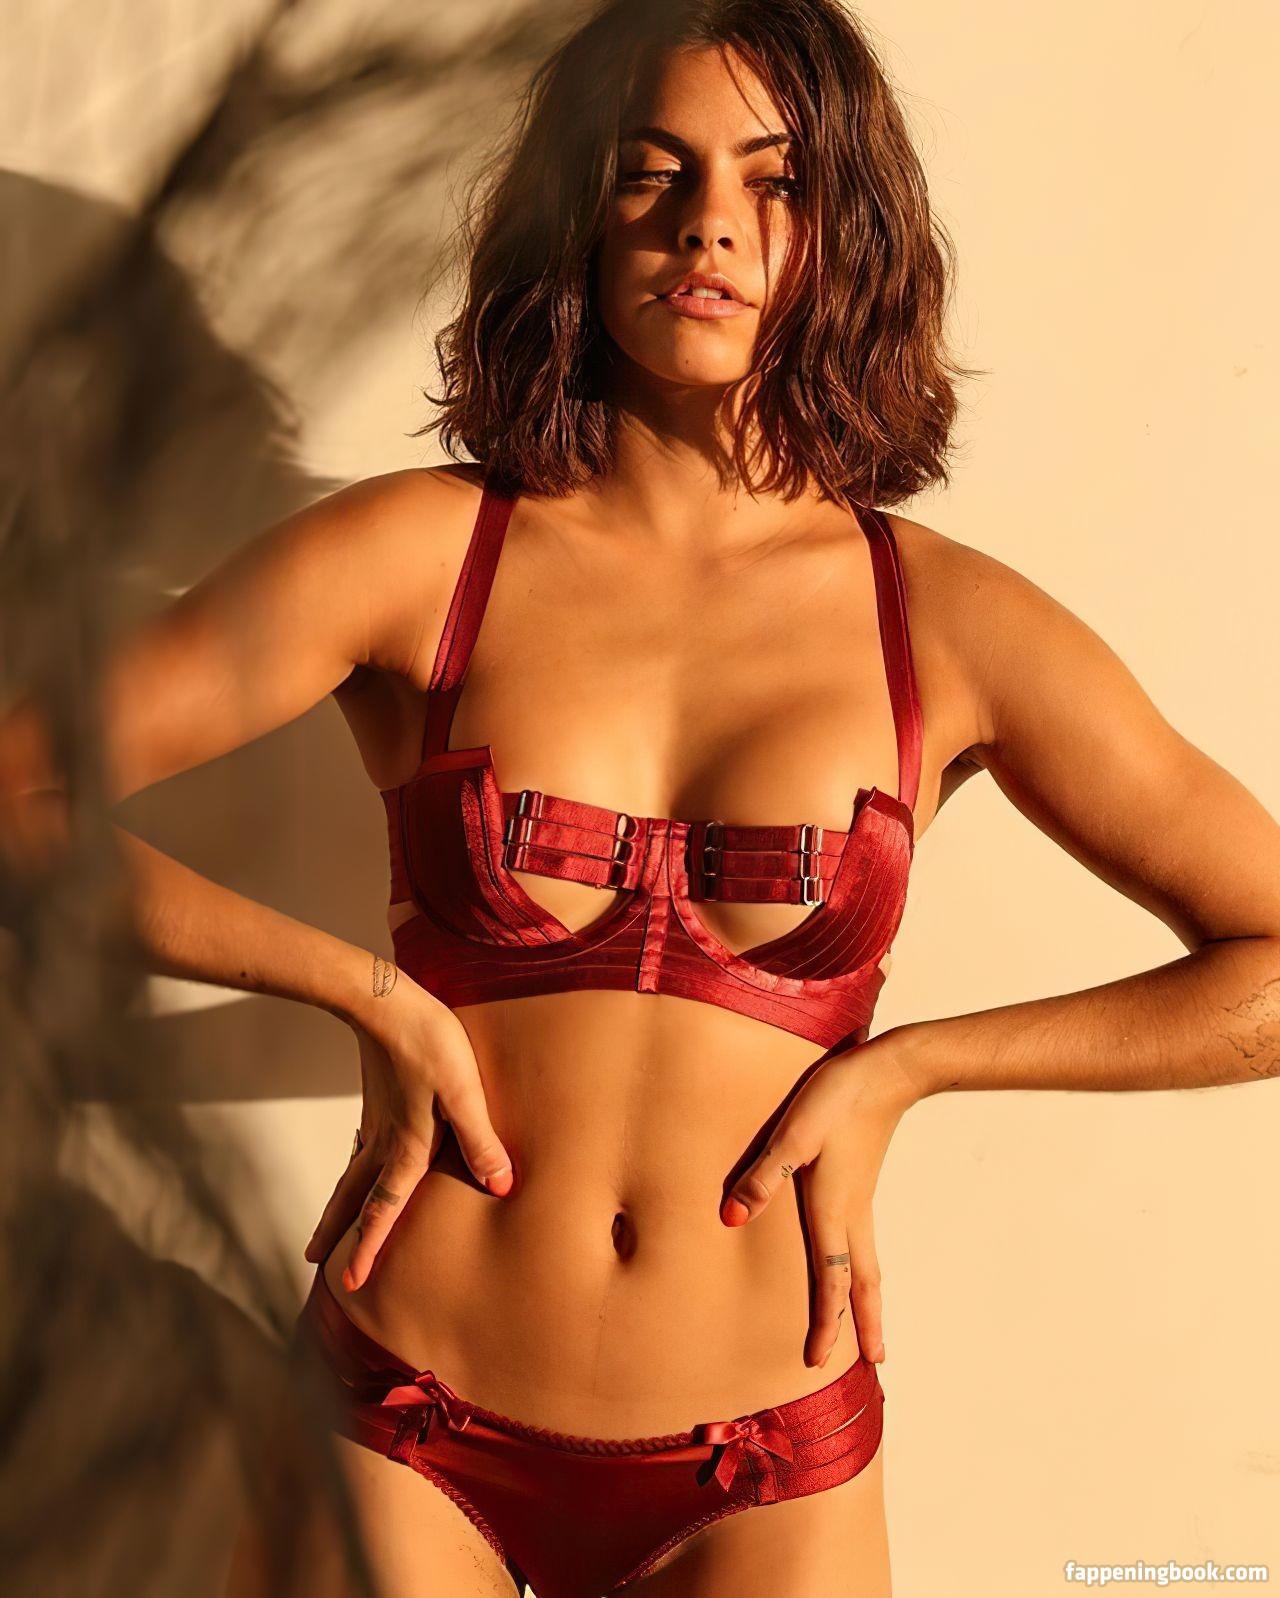 Mimi Elashiry Nude, Fappening, Sexy Photos, Uncensored